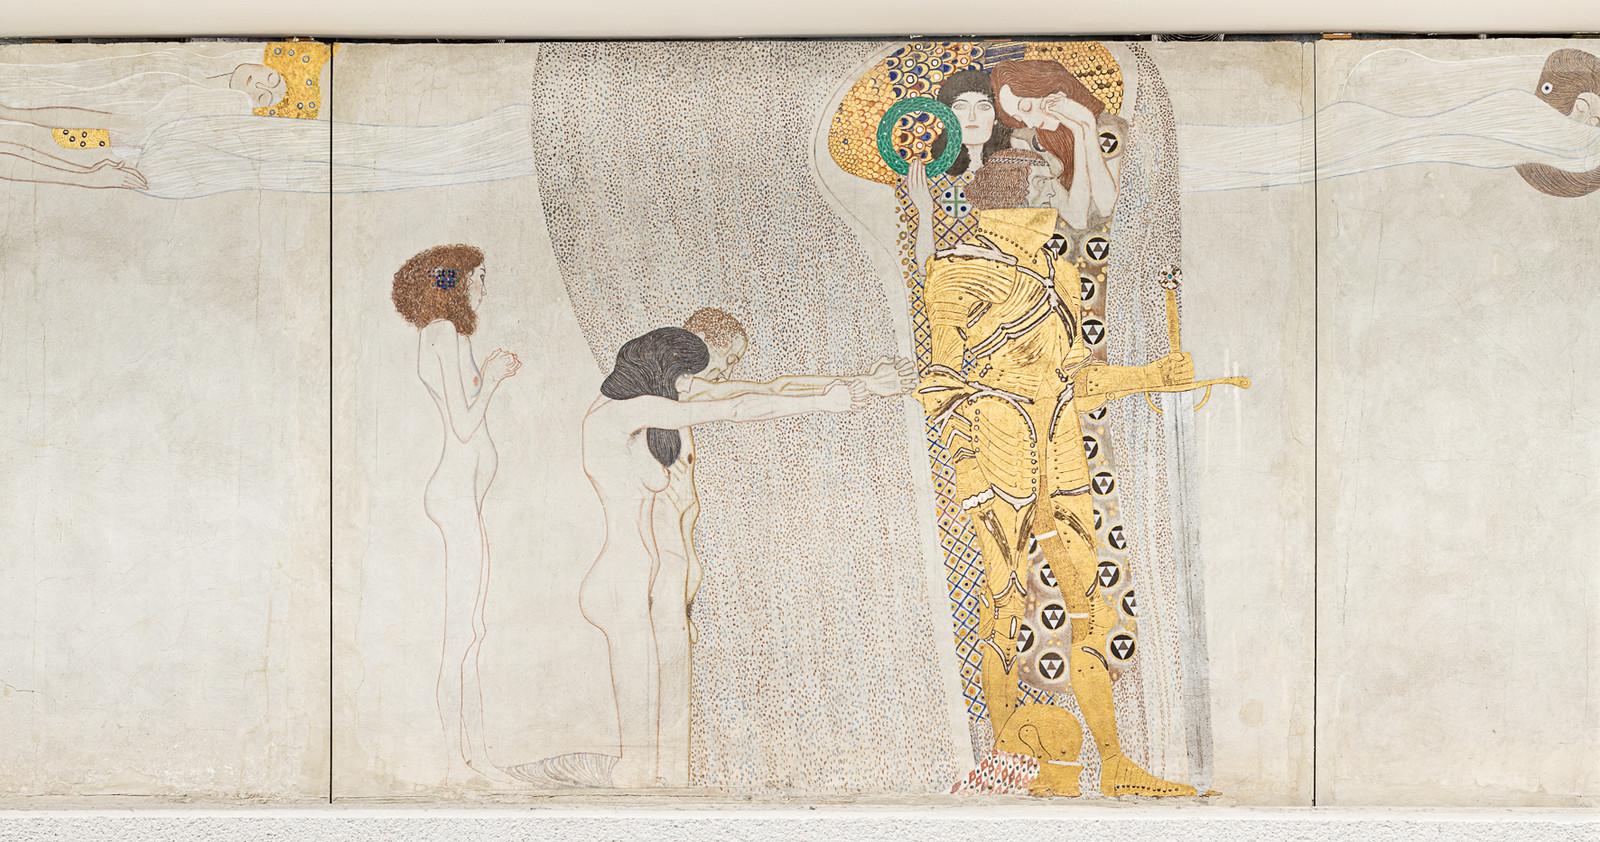 Gustav Klimt, Beethoven-fries, detail rechtermuur (Floating Genii and Poetry), Secession, Wenen.